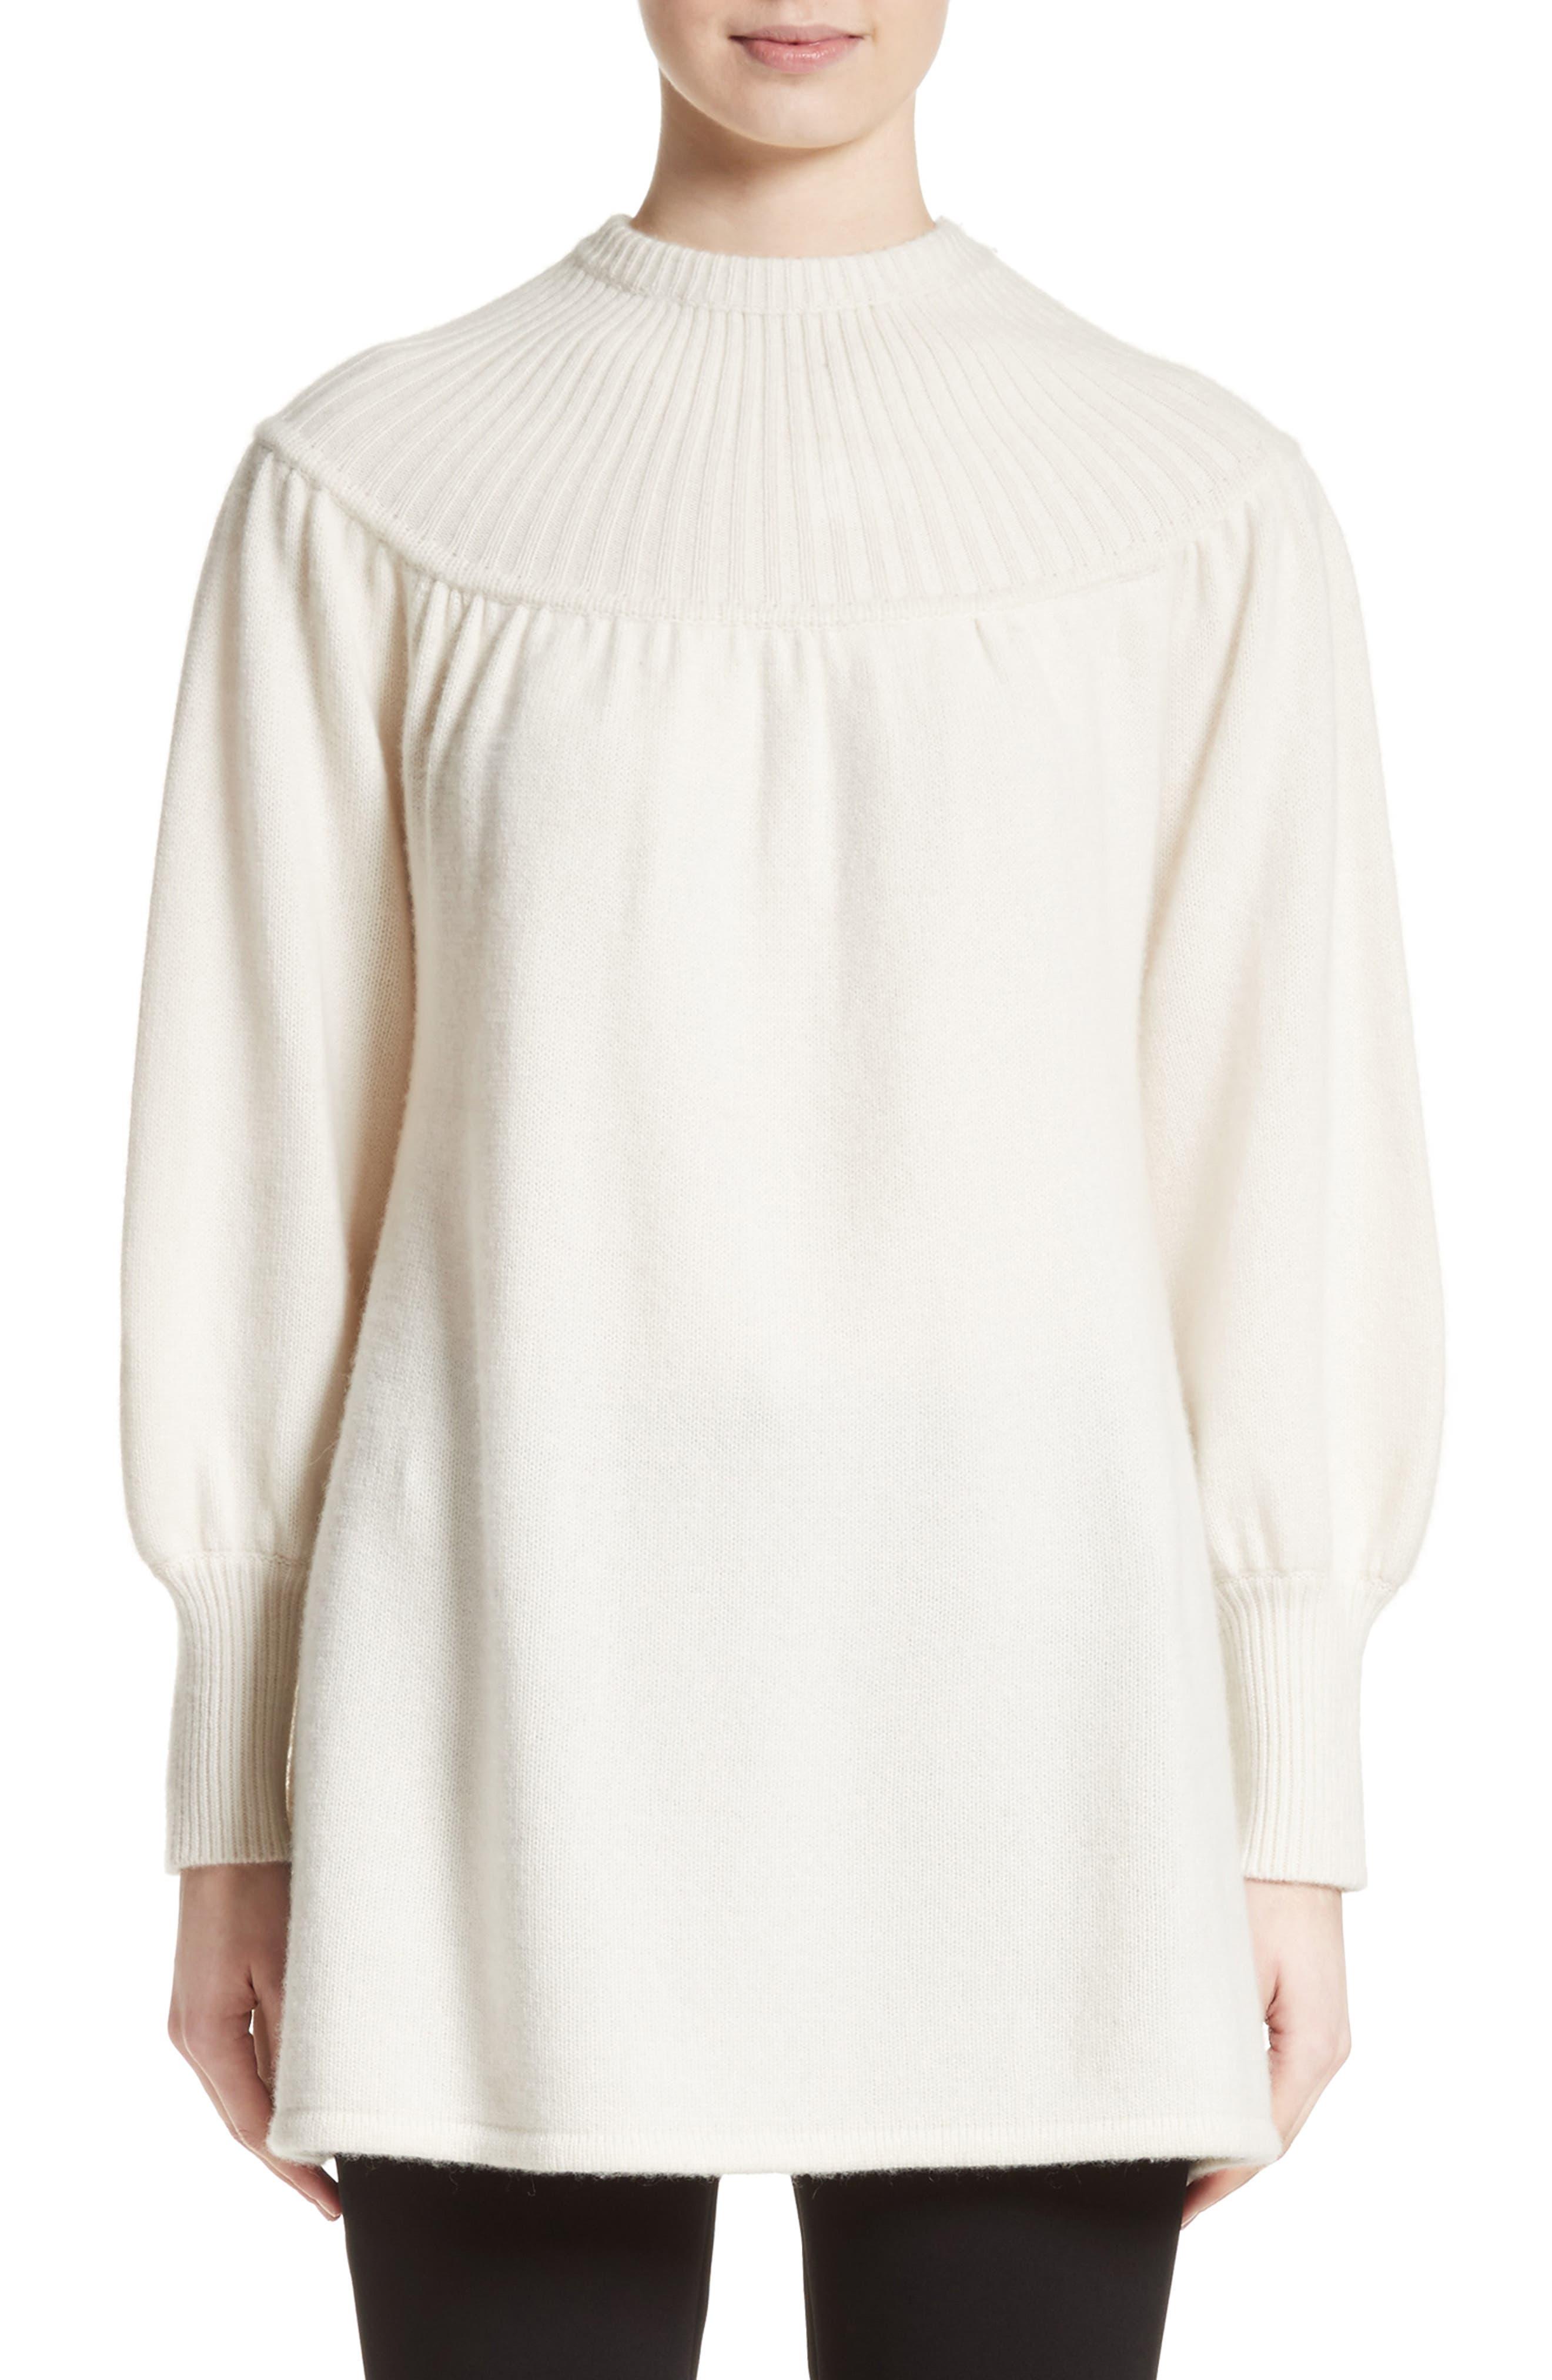 Rib Knit Cashmere Tunic Sweater,                         Main,                         color, 900